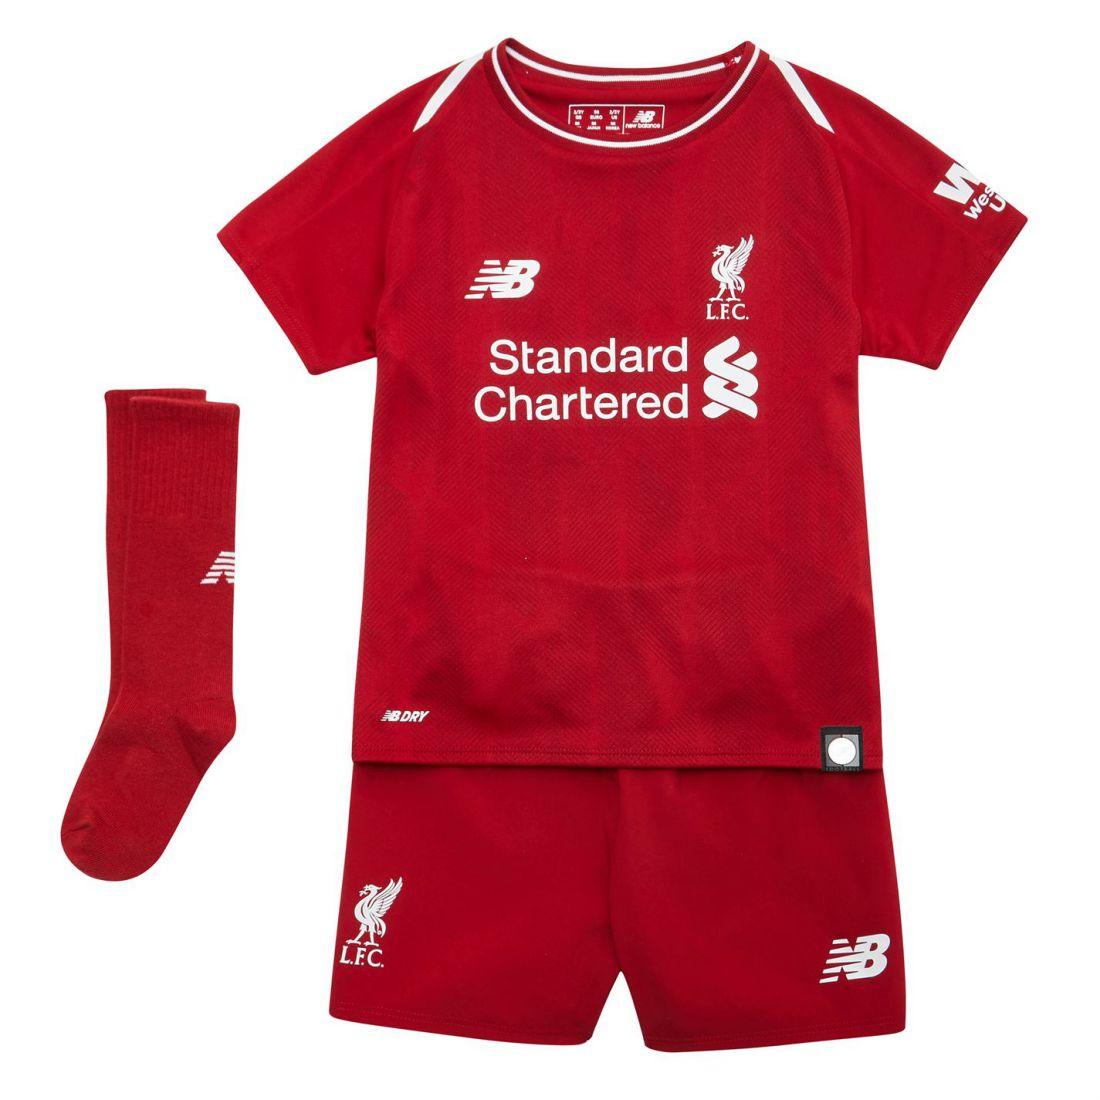 648b14747 Details about New Balance Kids Liverpool Home Mini Kit 2018 2019 Domestic  Minikits Football